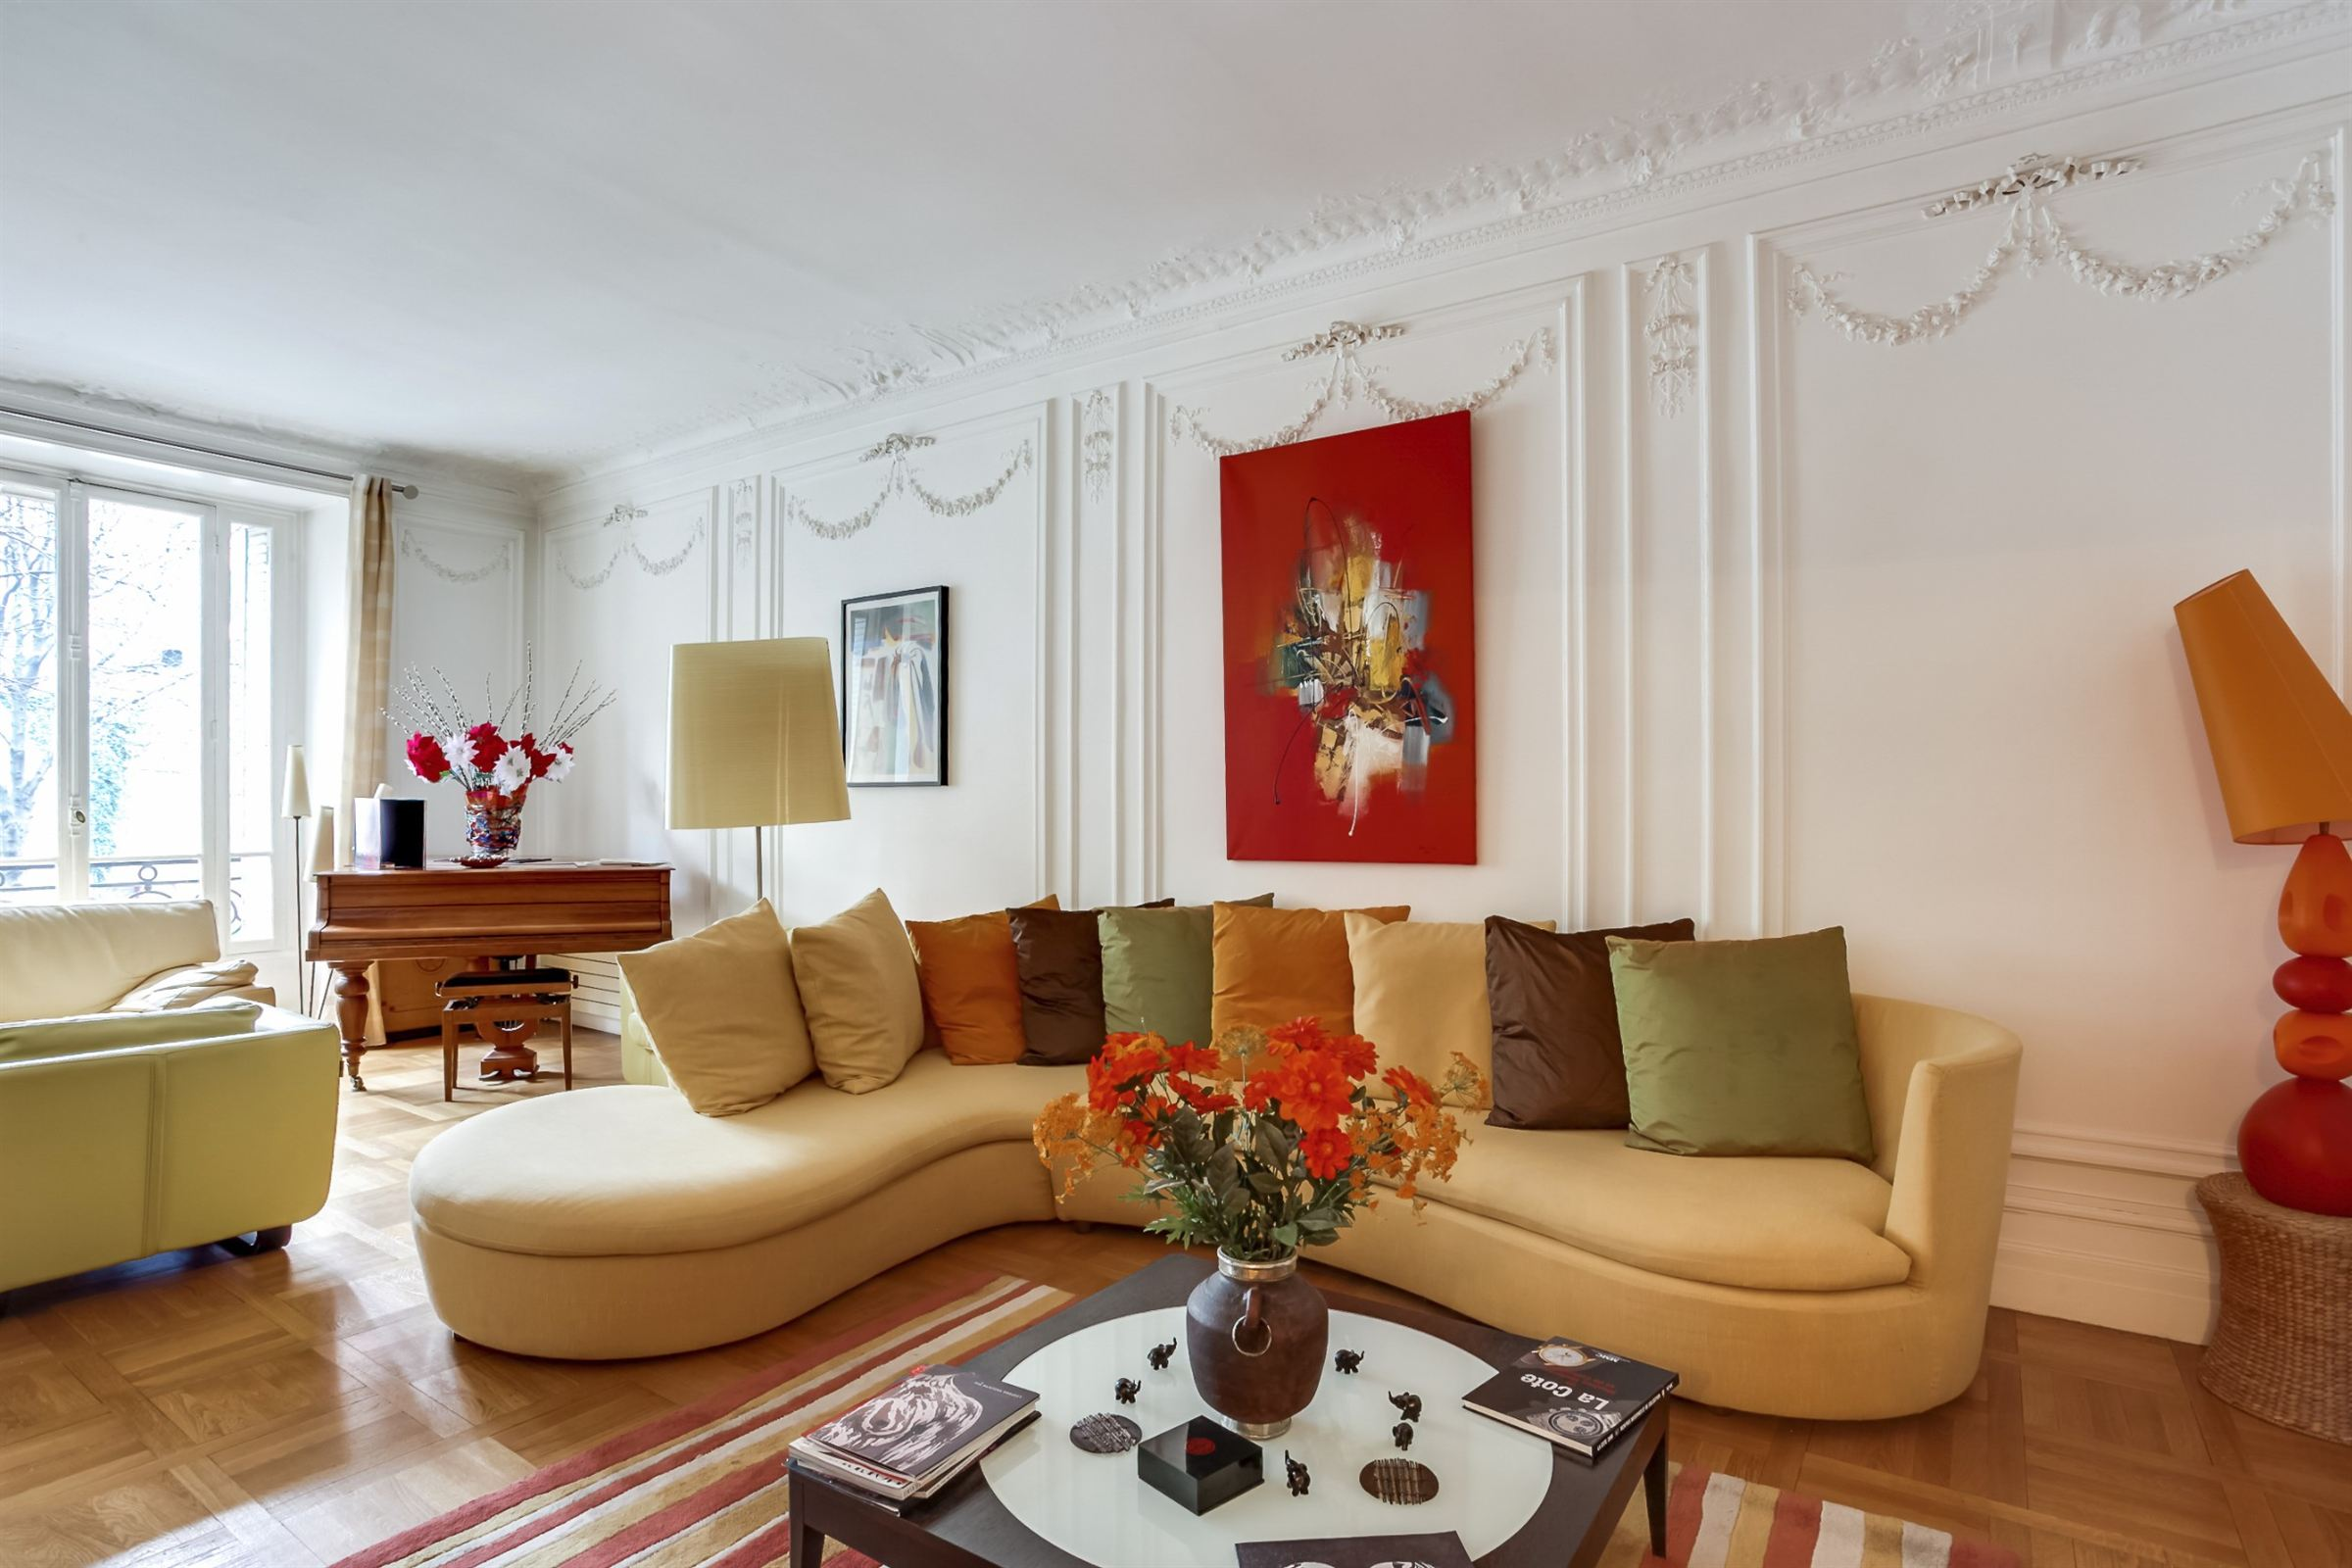 sales property at A 225 sq.m apartment for sale Paris 16 - Place de Costa Rica, 4 bedrooms